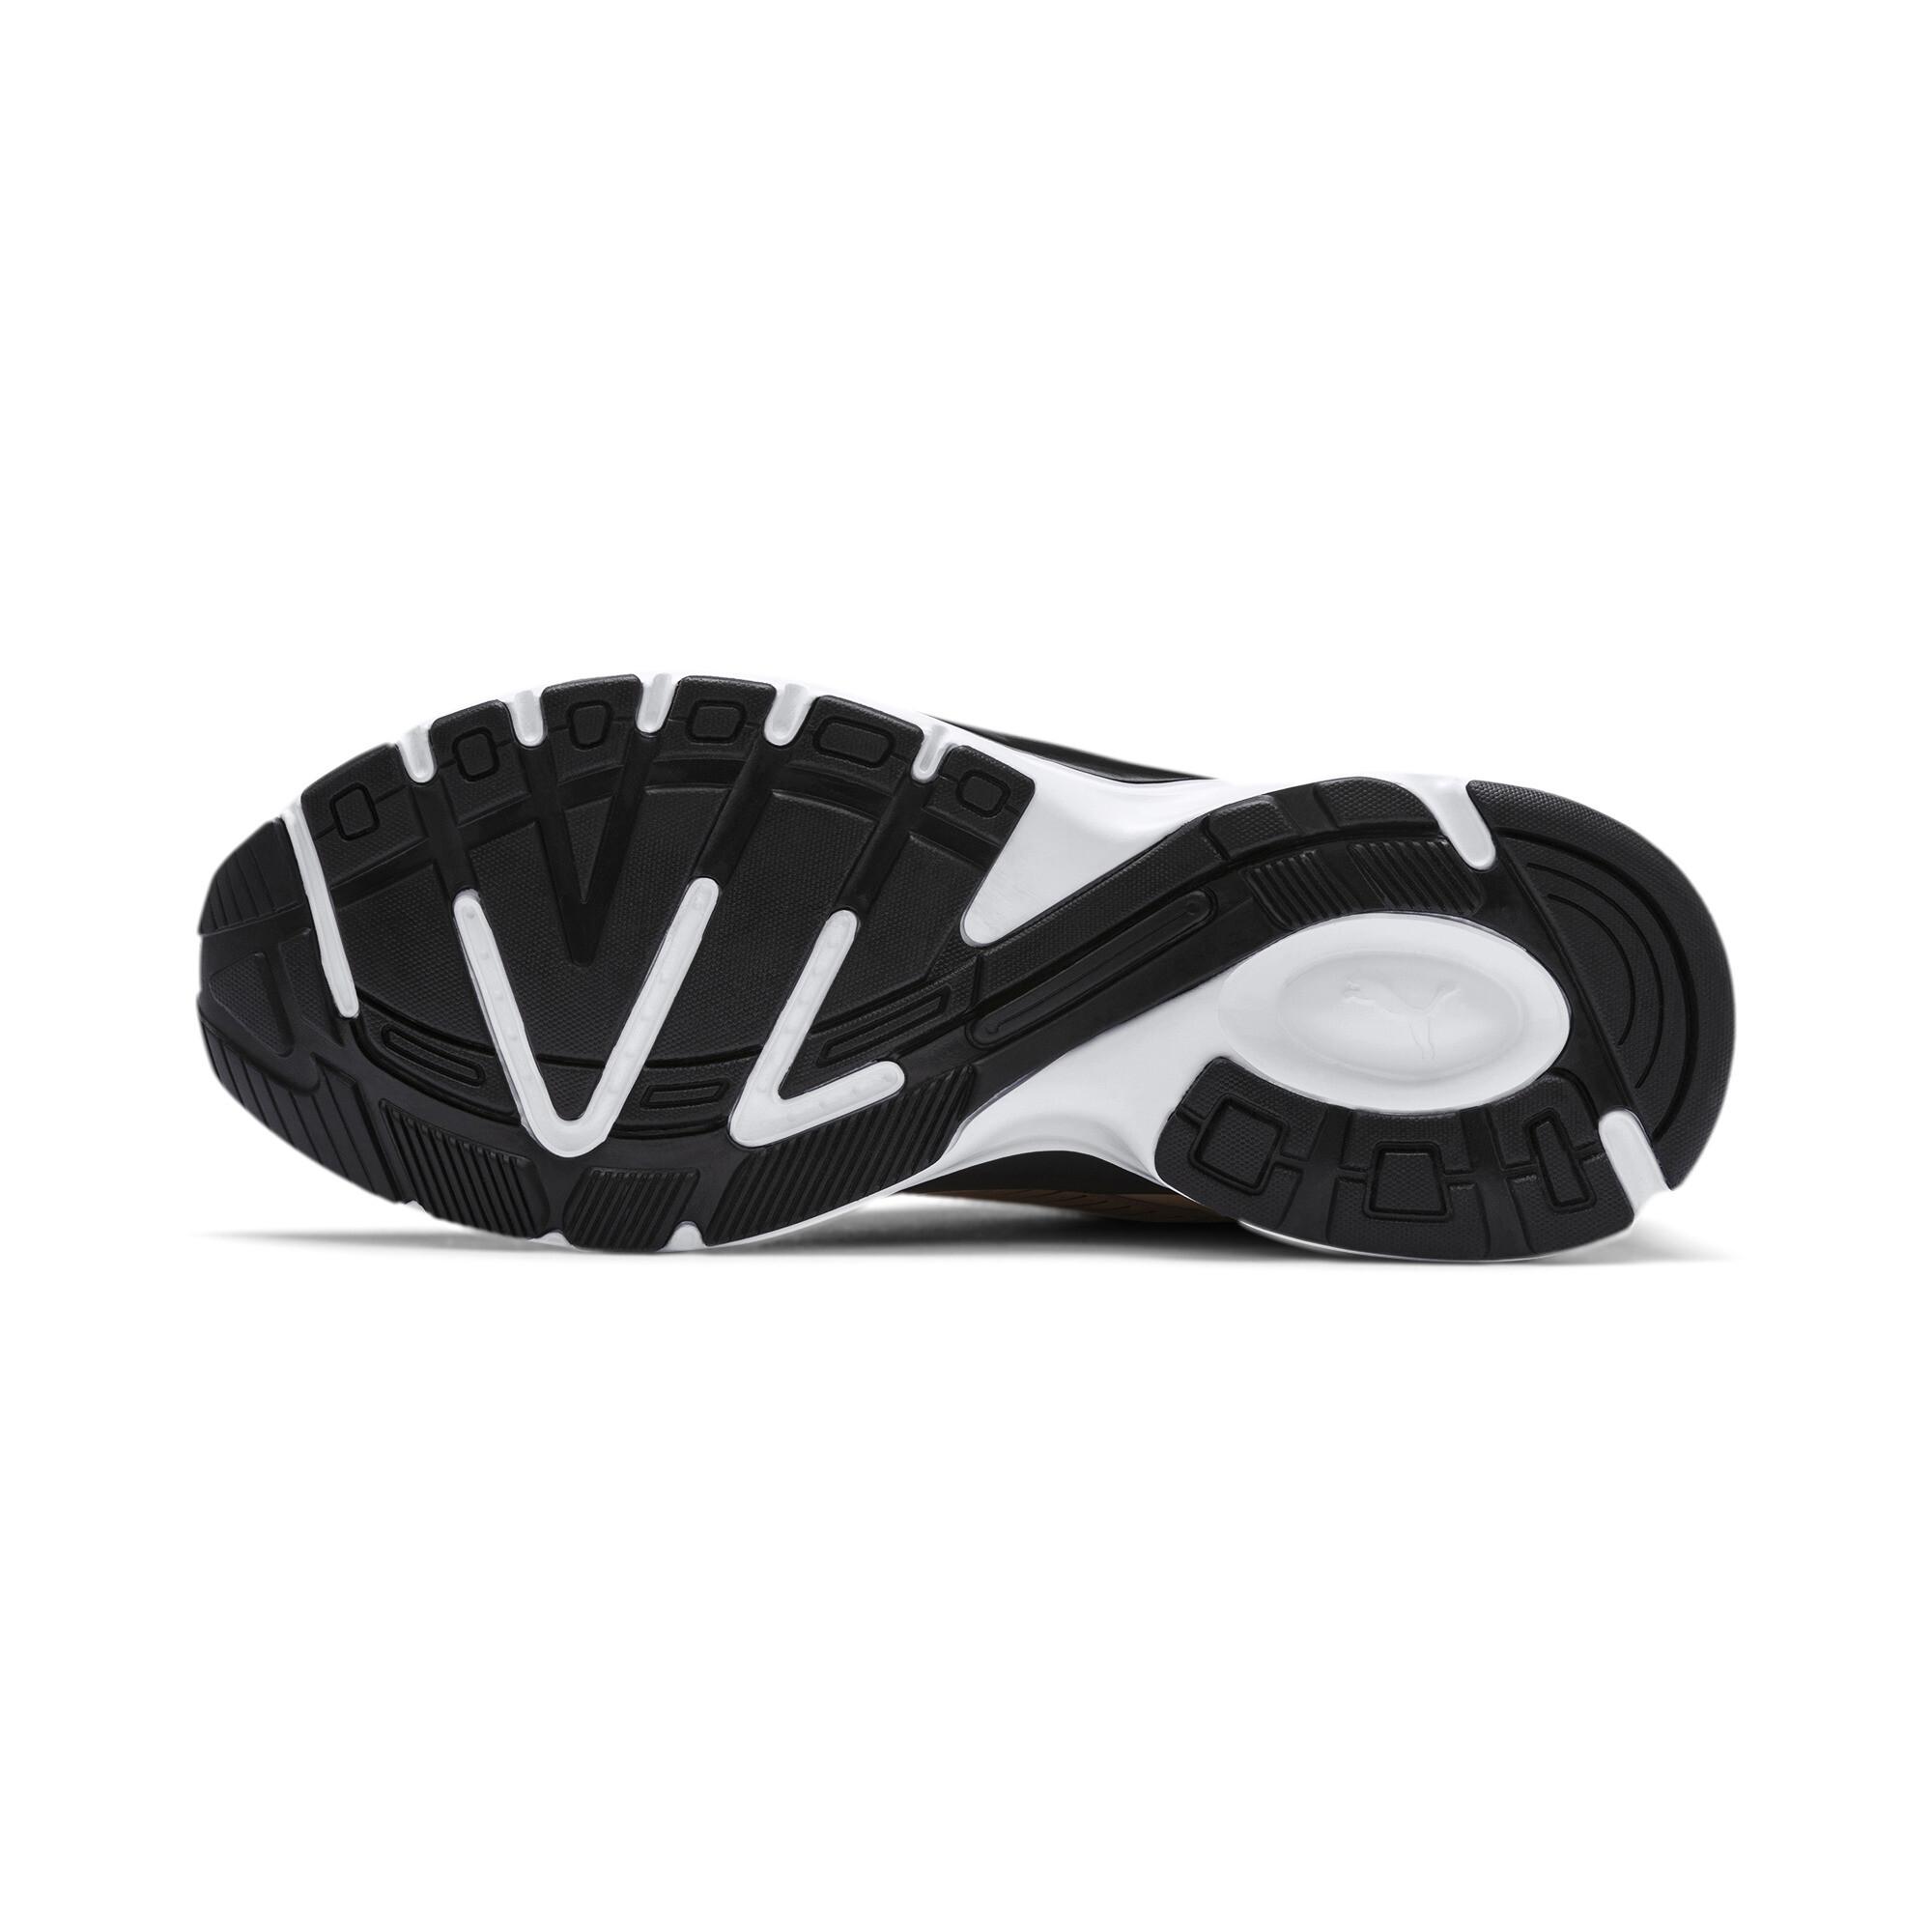 PUMA-Future-Runner-SL-Sneaker-Unisex-Schuhe-Basics-Neu Indexbild 9